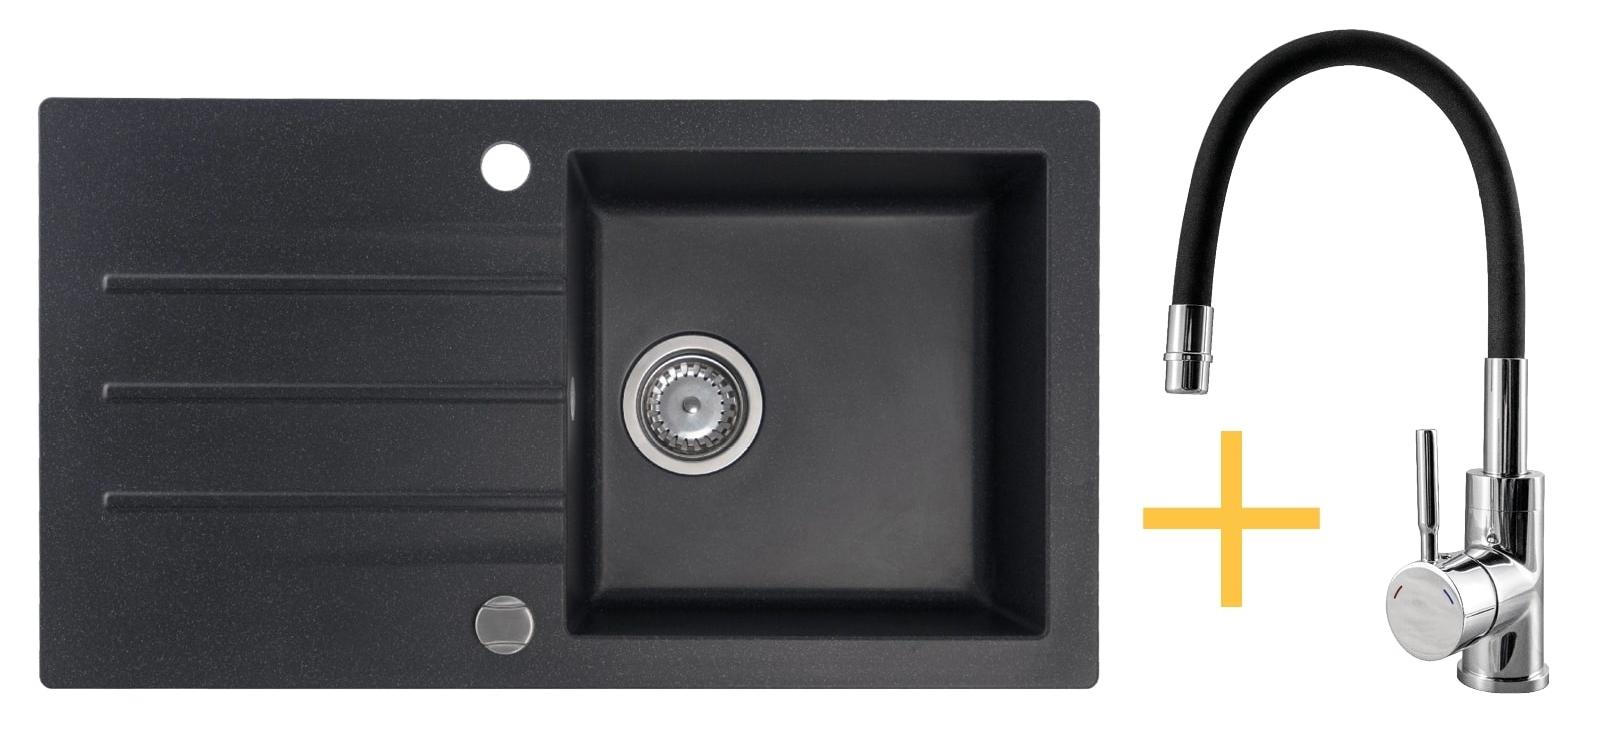 Zestaw zlewozmywak granitowy Kernau KGSA 50 1B1D Black Metallic + bateria KWT 29 Elastic Black